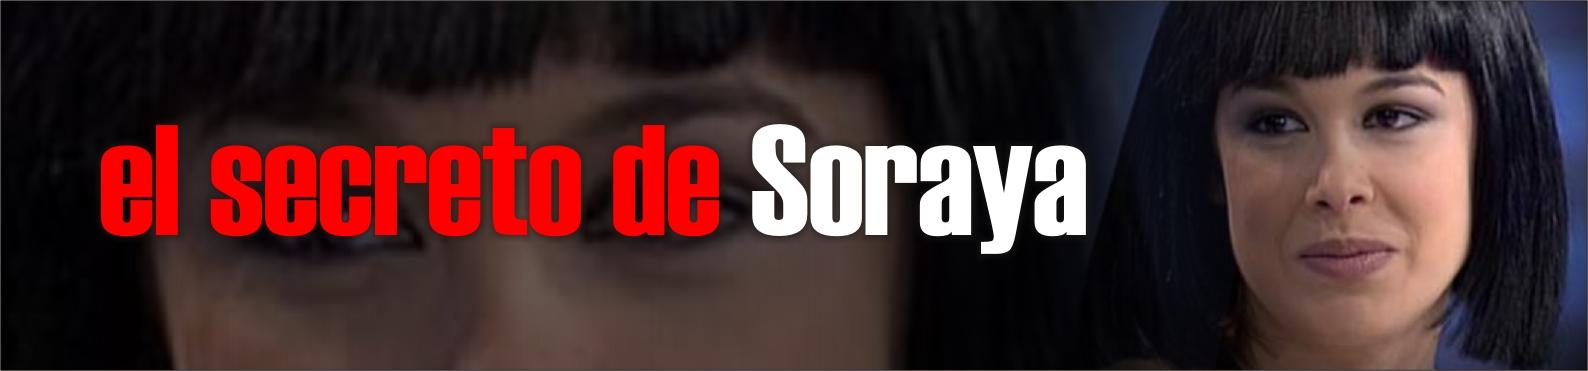 [SORAYA+EL+SECRETO+20.jpg]